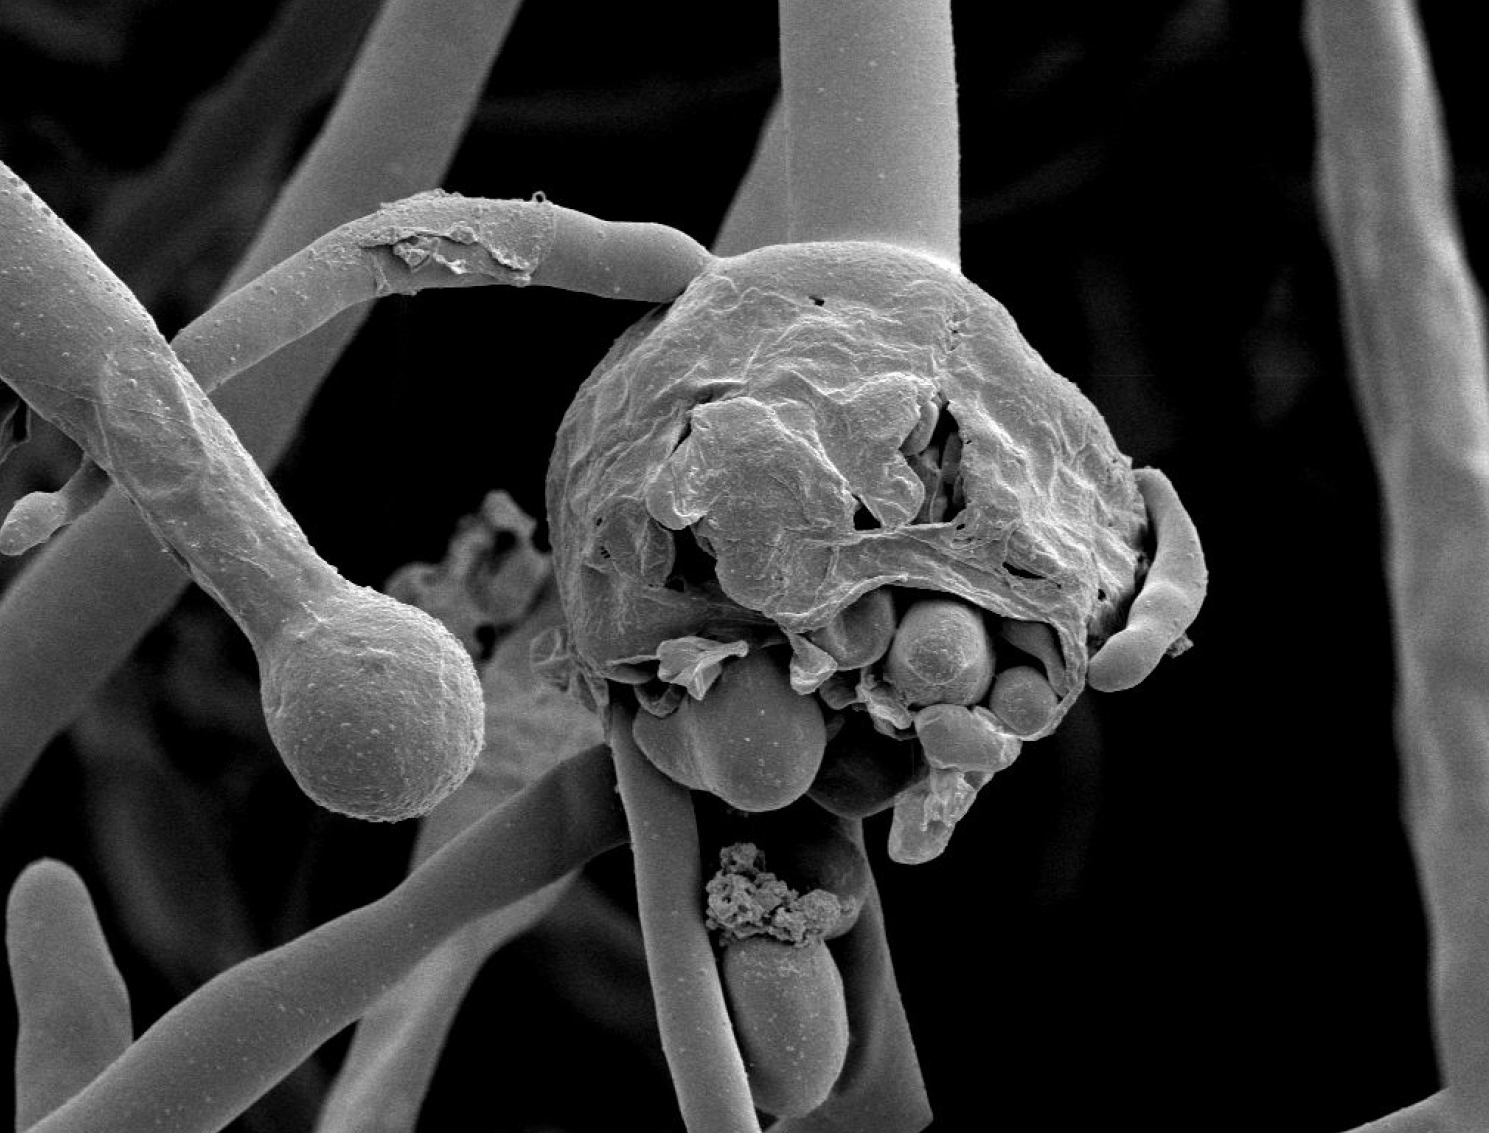 India's Black Fungus Epidemic Sparks Misinformation Storm